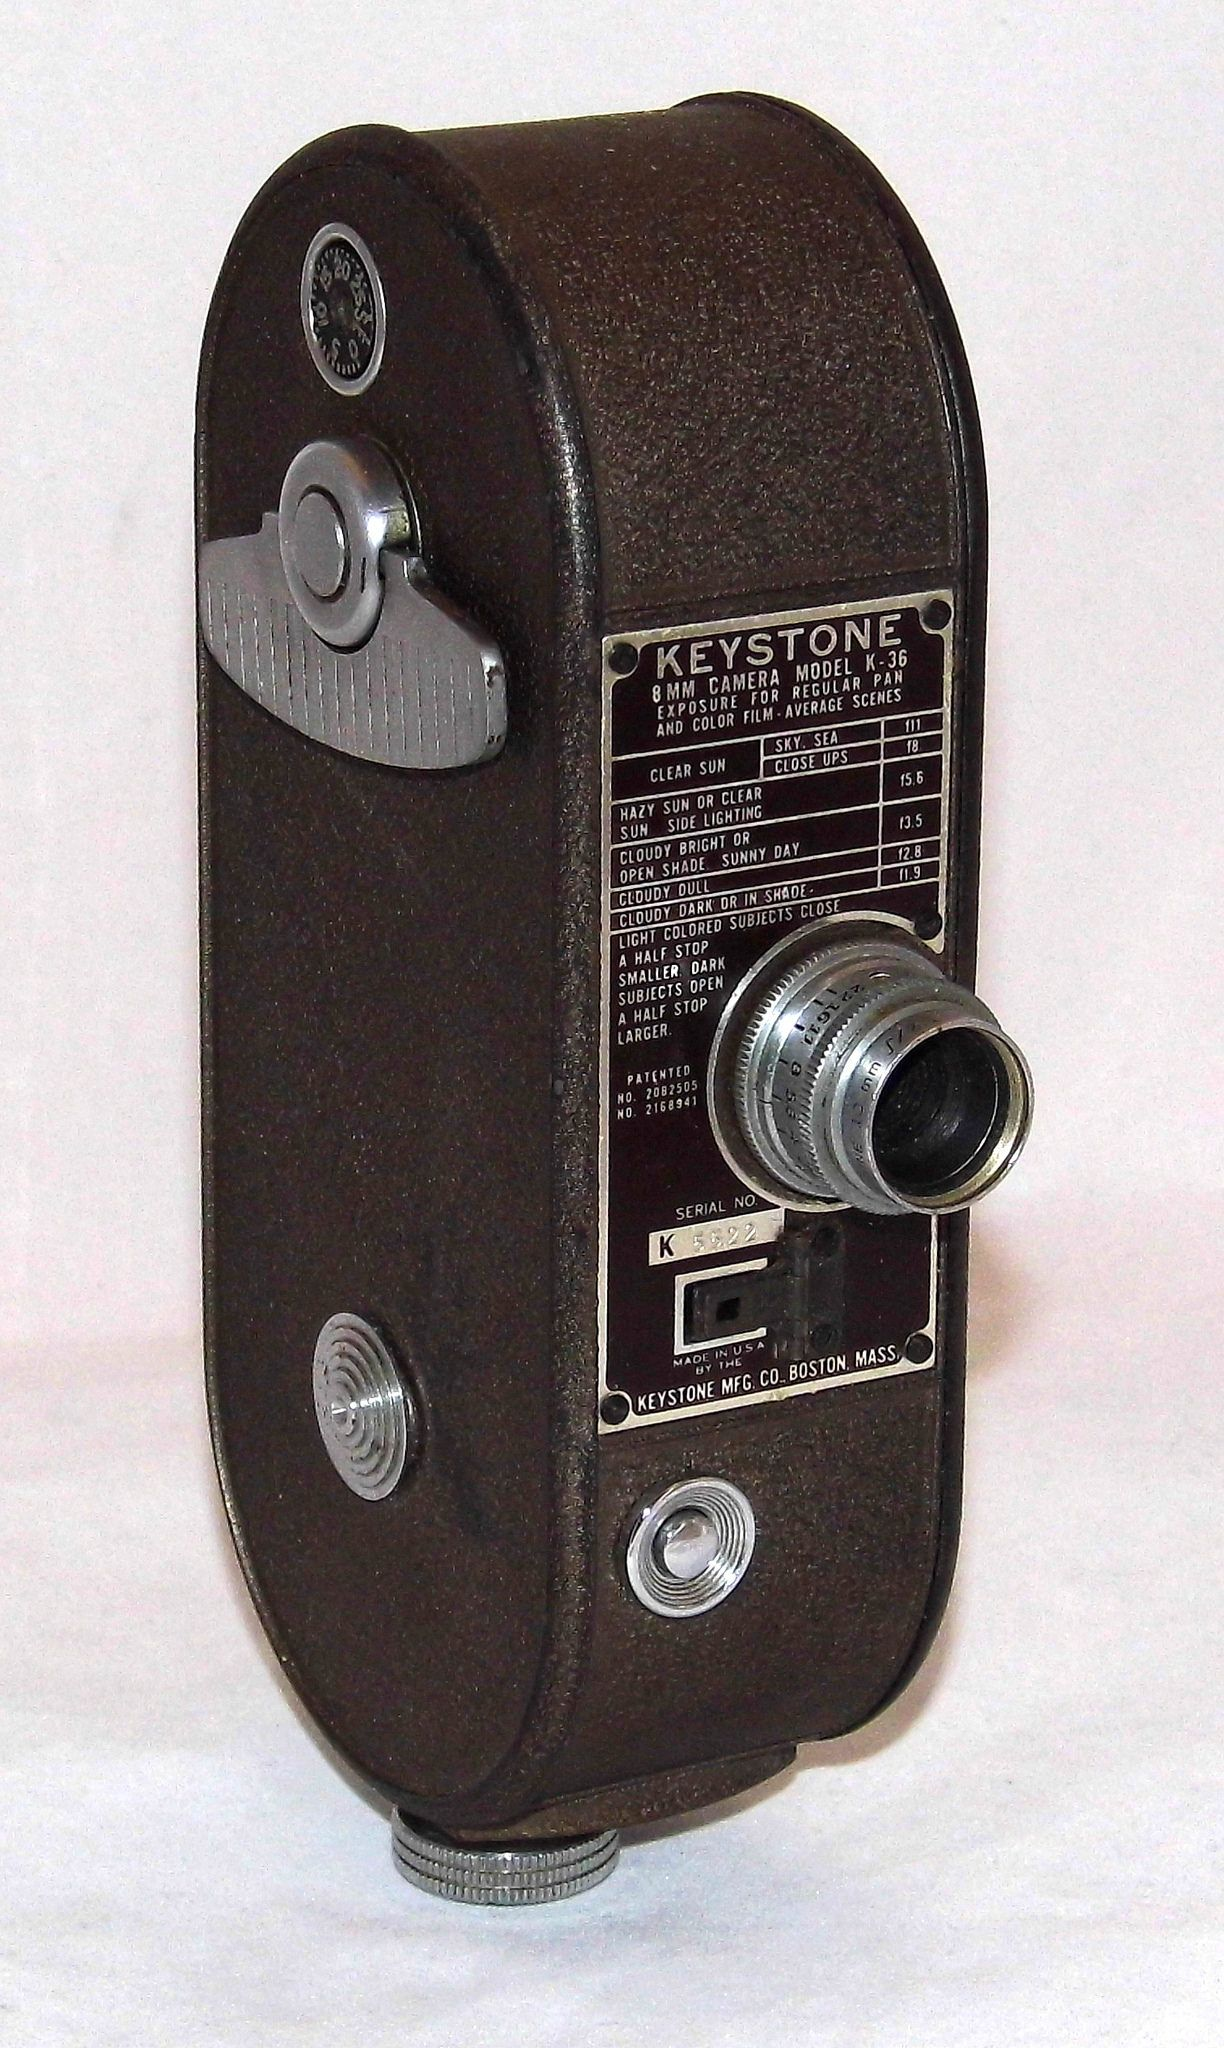 8Mm Vintage Camera vintage keystone 8mm home movie camera, model k-36, made in